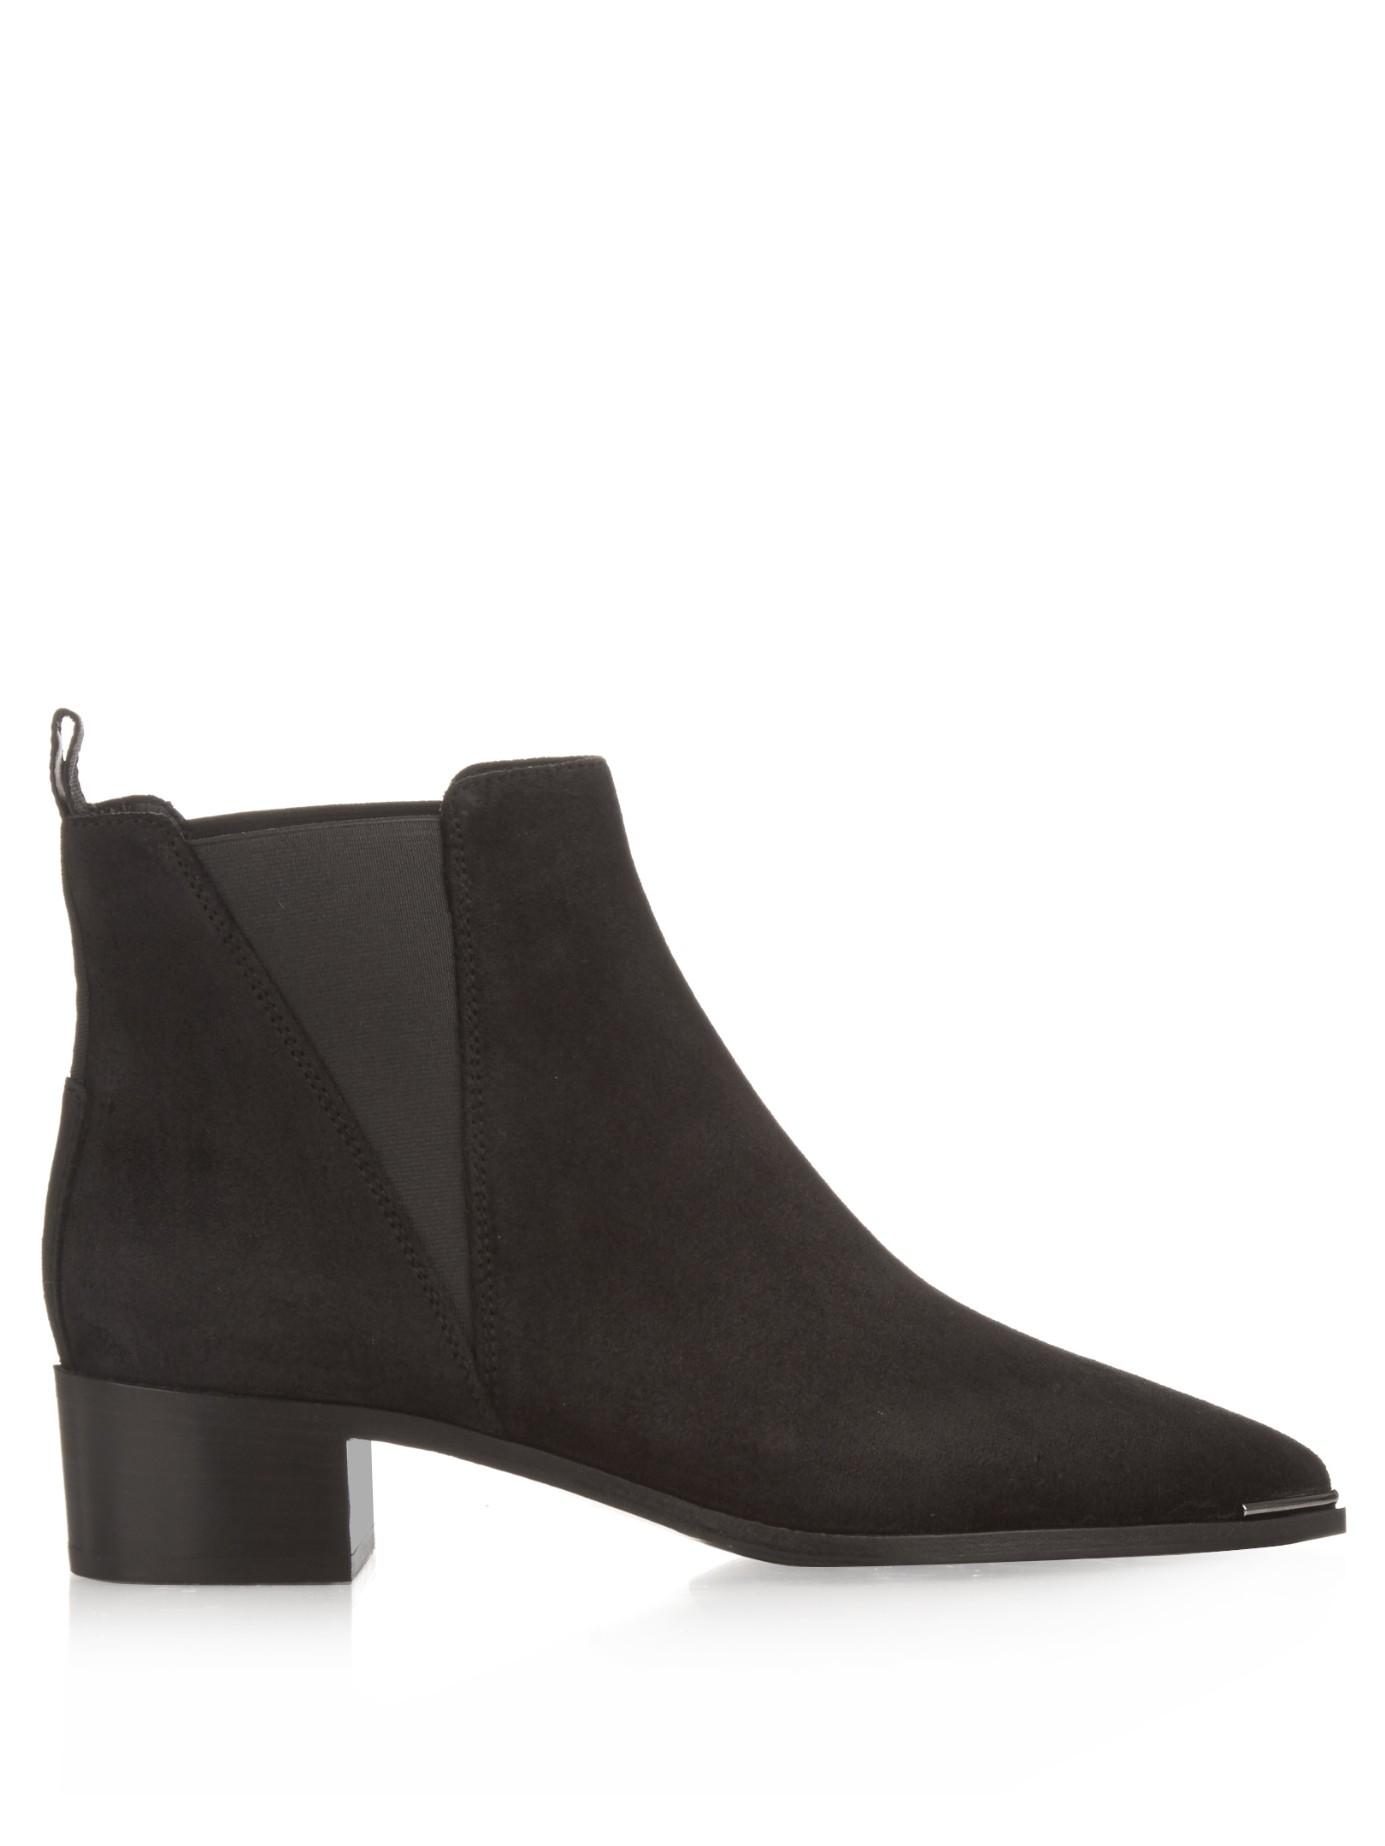 acne studios jensen suede ankle boots in black lyst. Black Bedroom Furniture Sets. Home Design Ideas